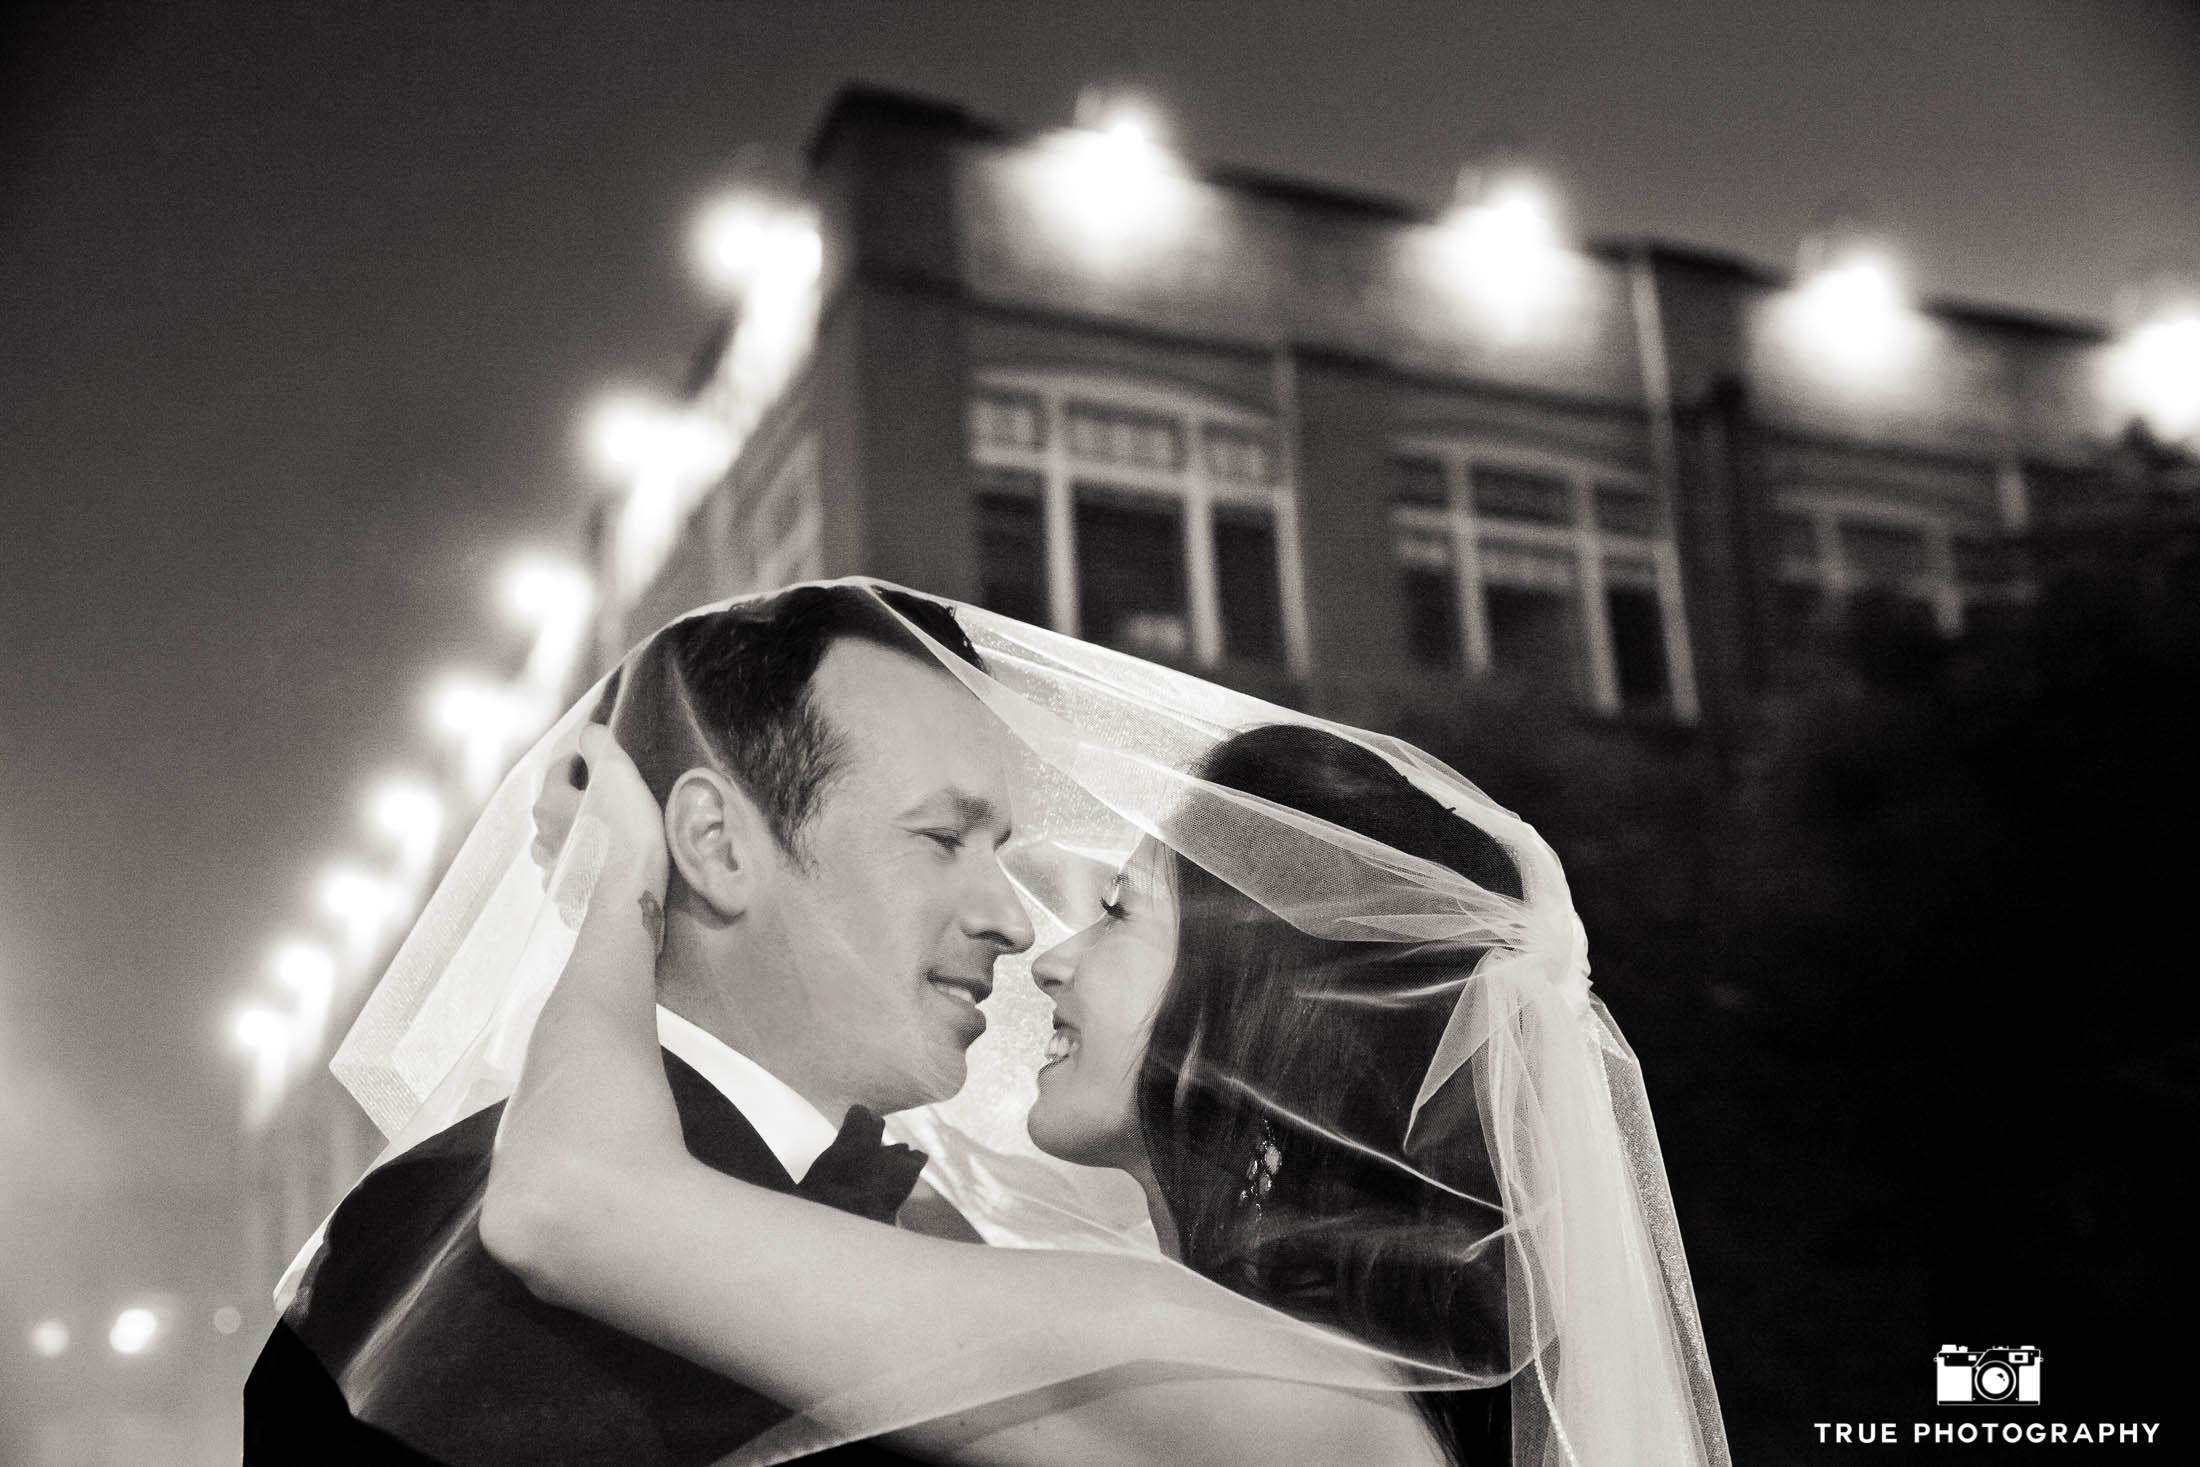 Foggy night shot of bride and groom